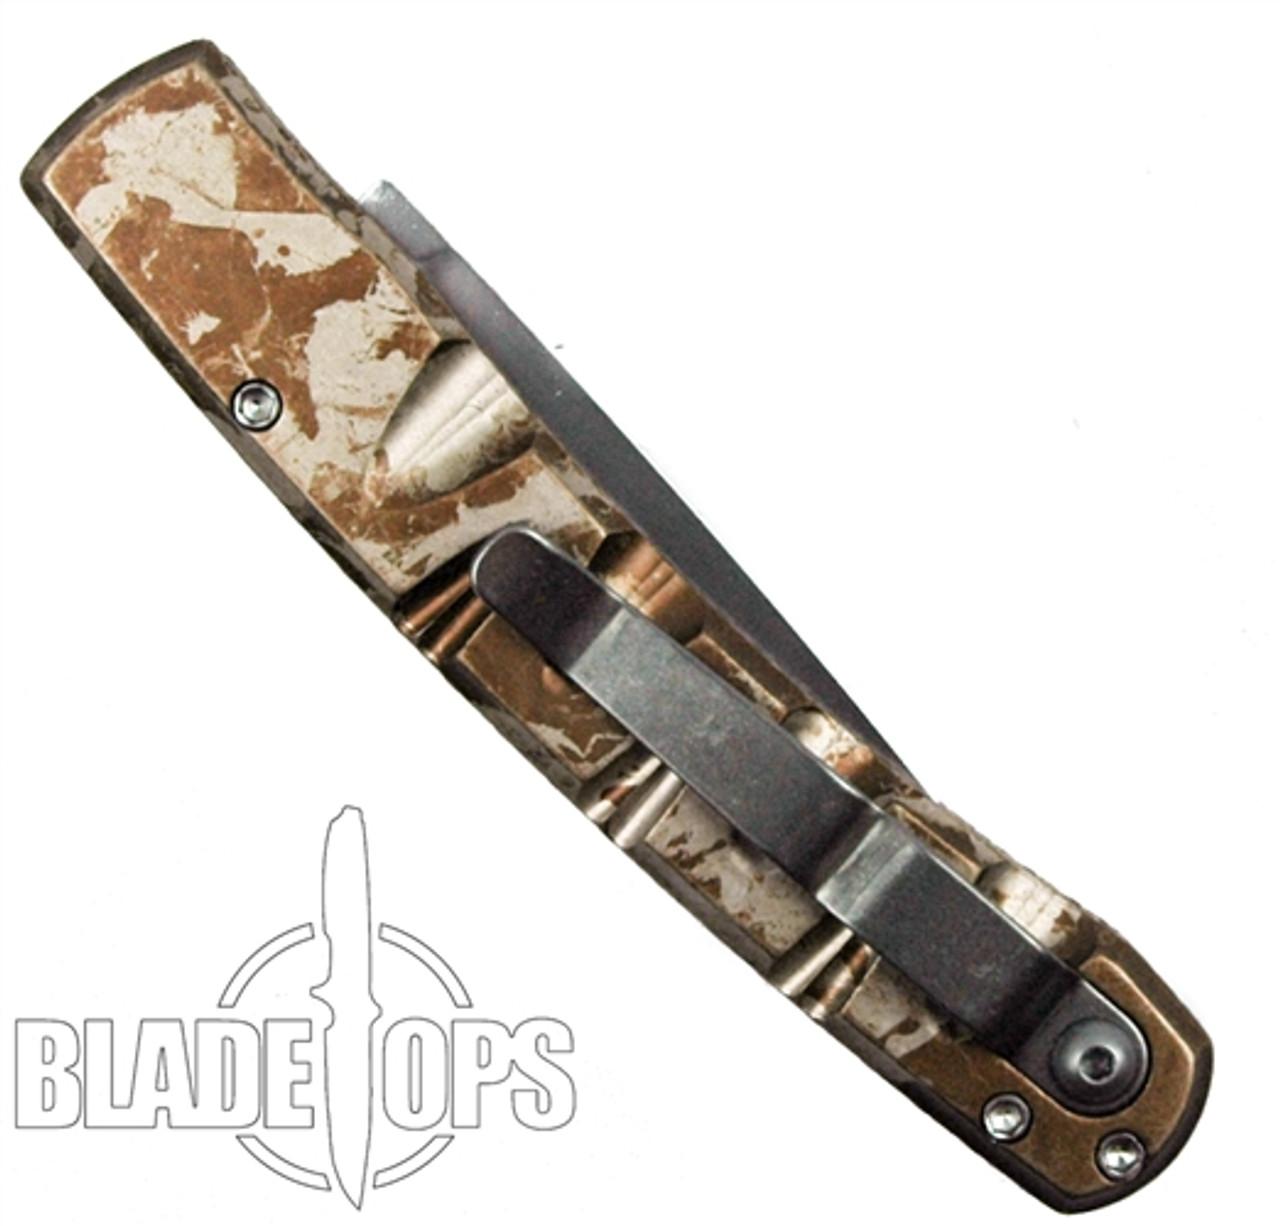 Piranha Desert Camo Virus Auto Knife, CPM-S30V Mirror Combo Blade